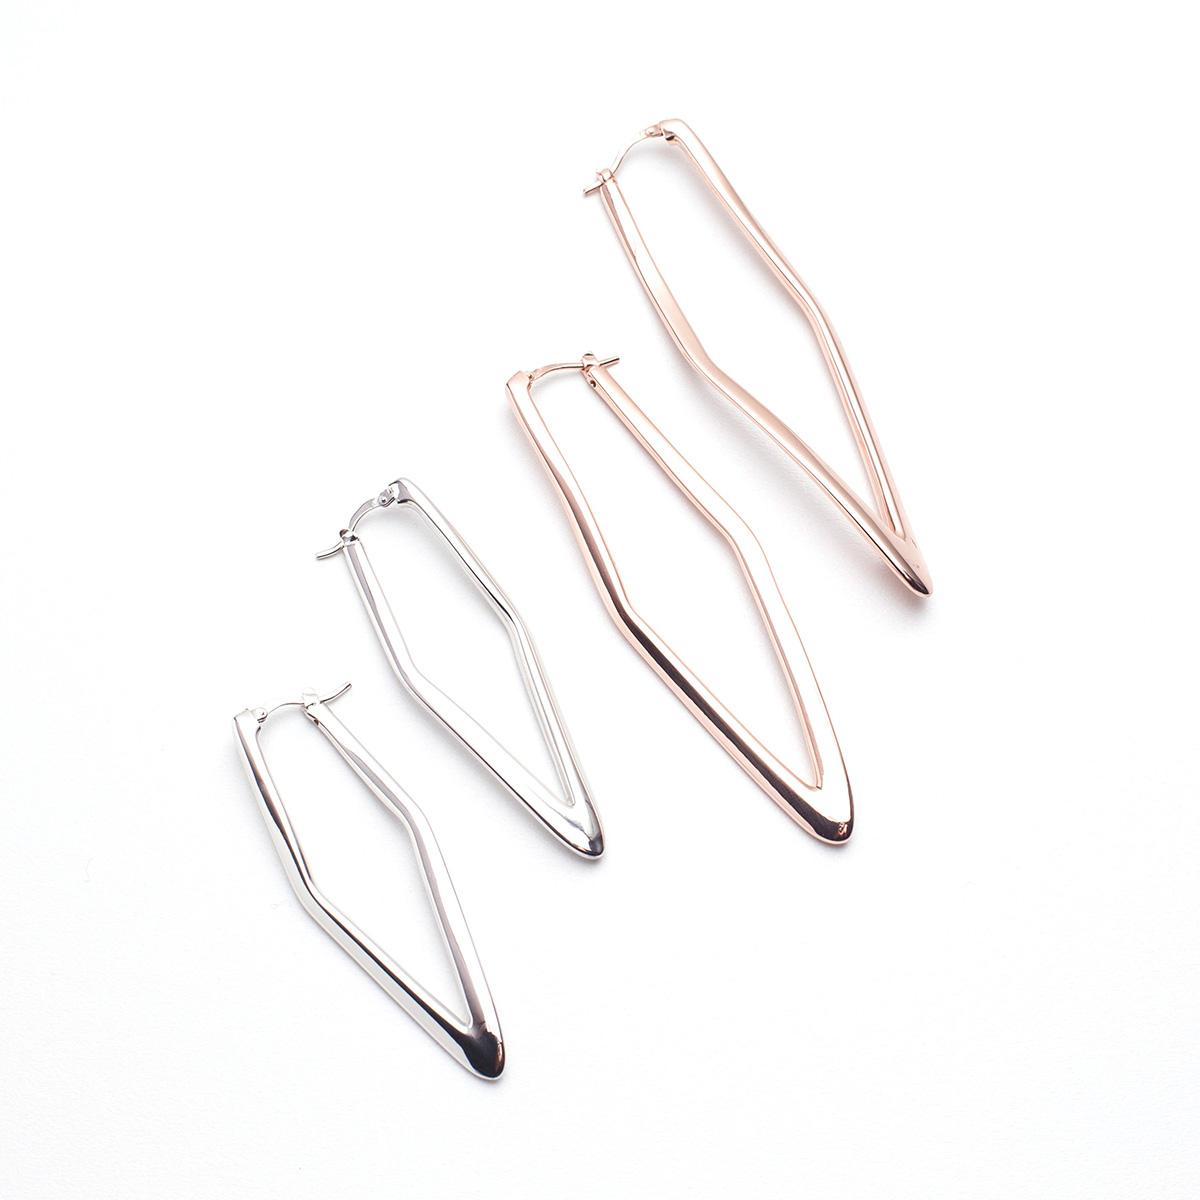 Linea Italia silver earrings made in italy